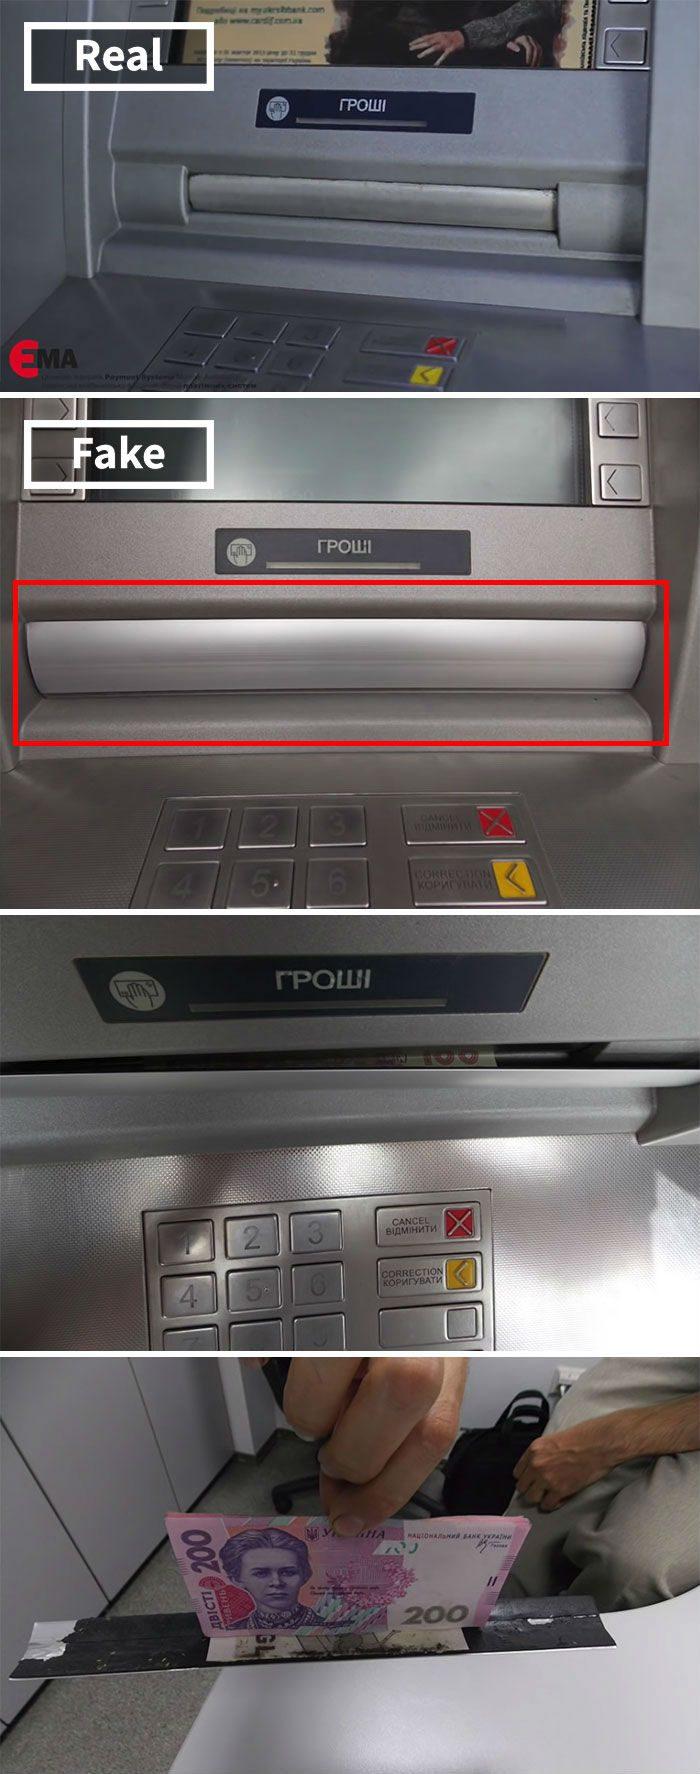 Изображение - Как можно ограбить банкомат сбербанка 7fa2f0e095